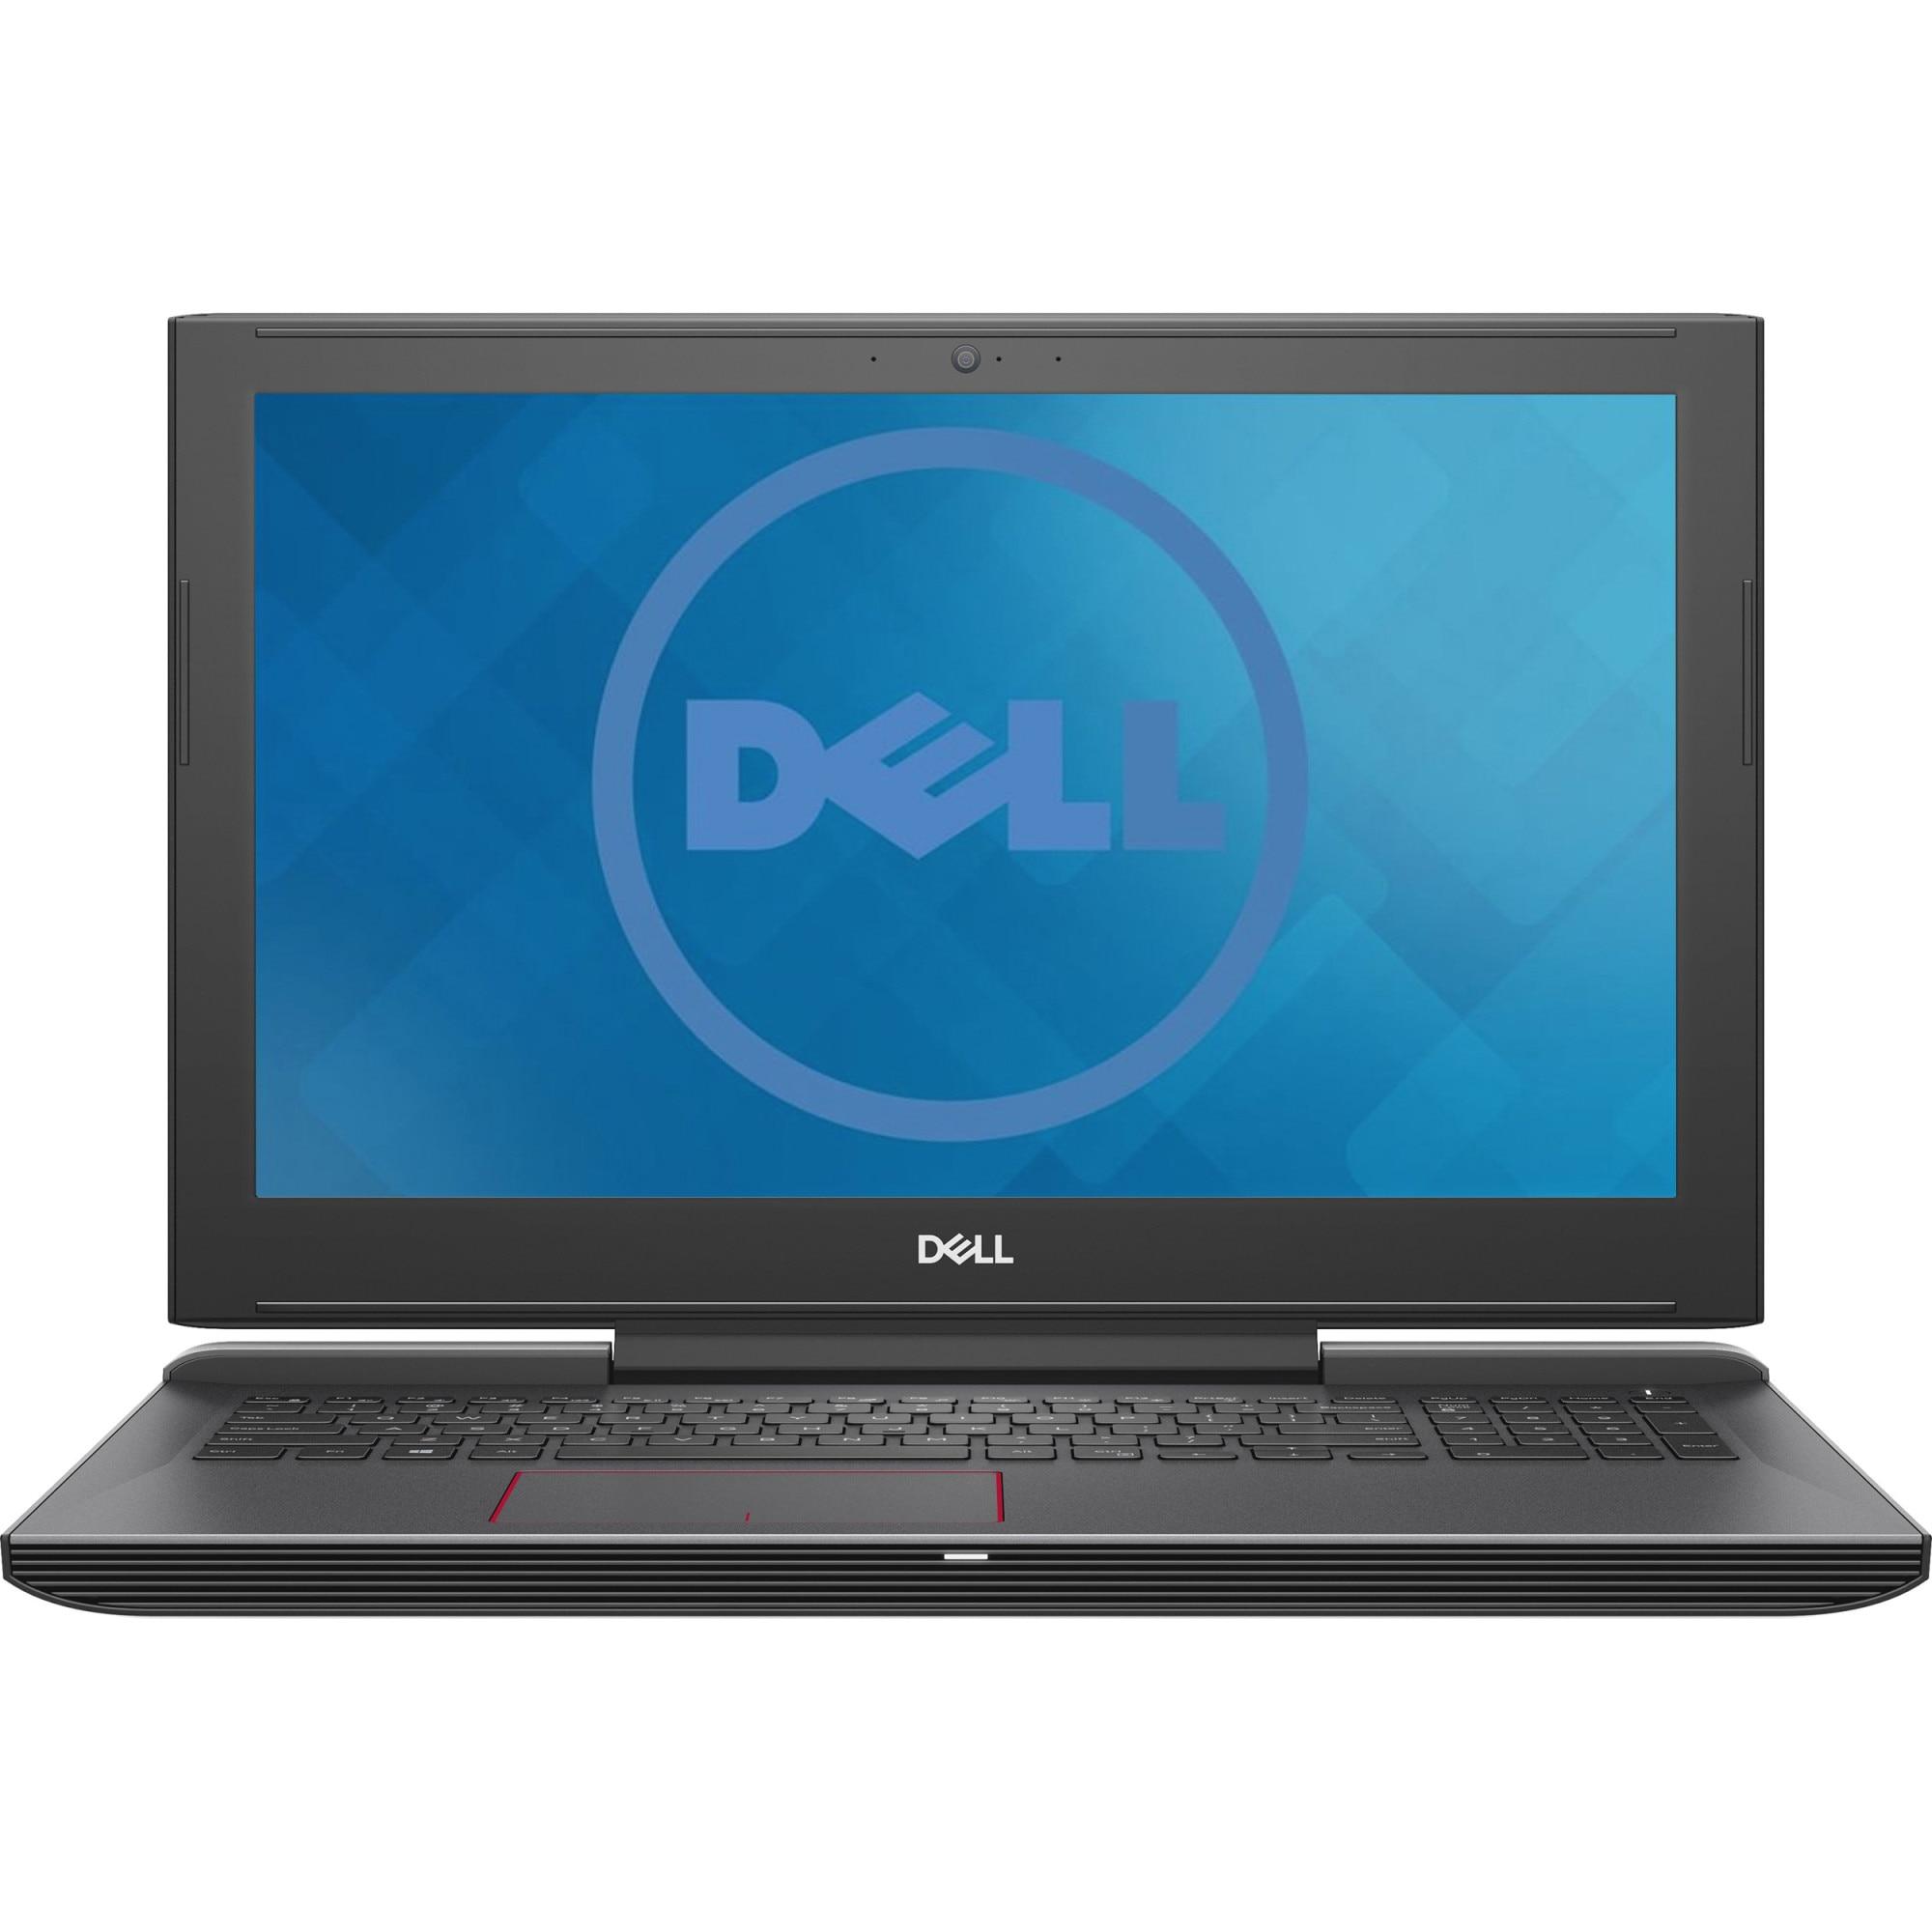 "Fotografie Laptop Gaming Dell G5 15 5587 cu procesor Intel® Core™ i7-8750H pana la 4.10 GHz, Coffee Lake, 15.6"", Full HD, 16GB, 1TB HDD + 256GB SSD, NVIDIA GeForce GTX 1060 6GB, Linux, Black"